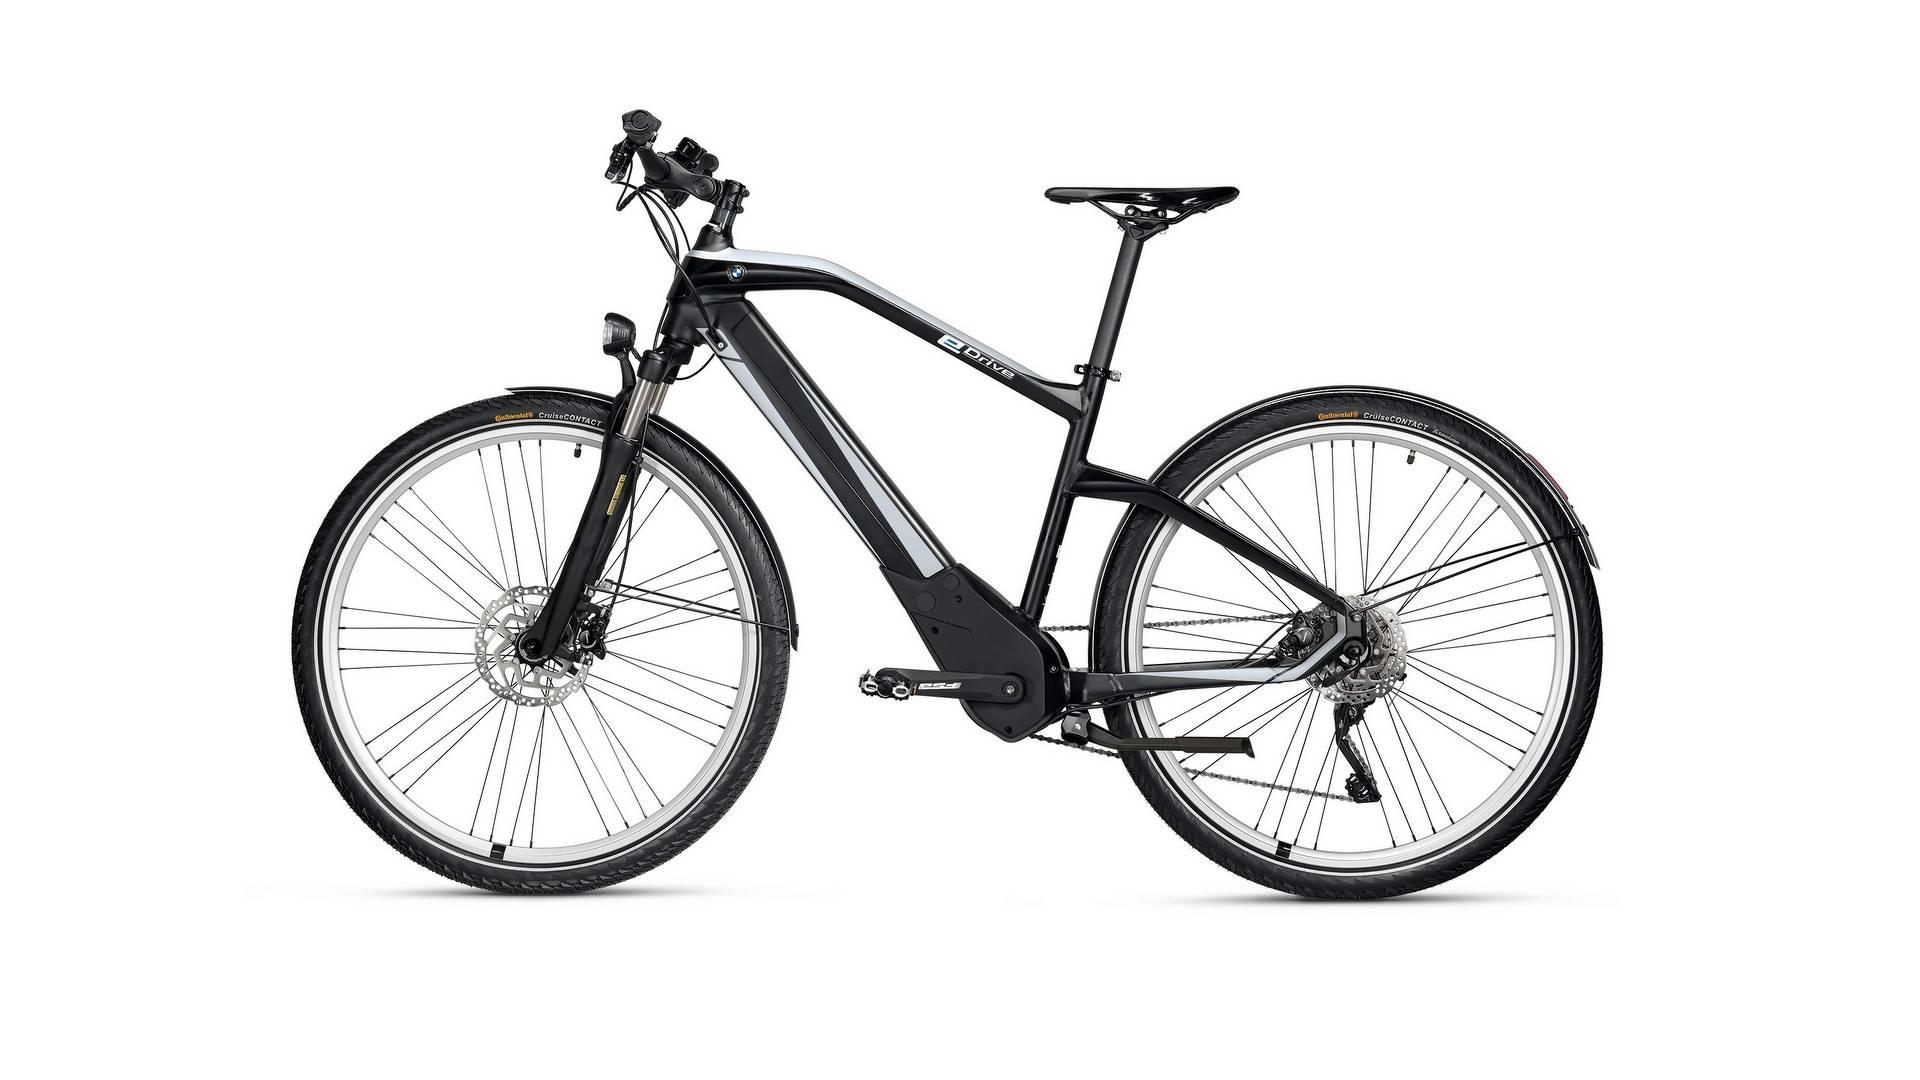 69c9de6f1c1 $4,000 bmw e-bike has as much torque as a renault twingo